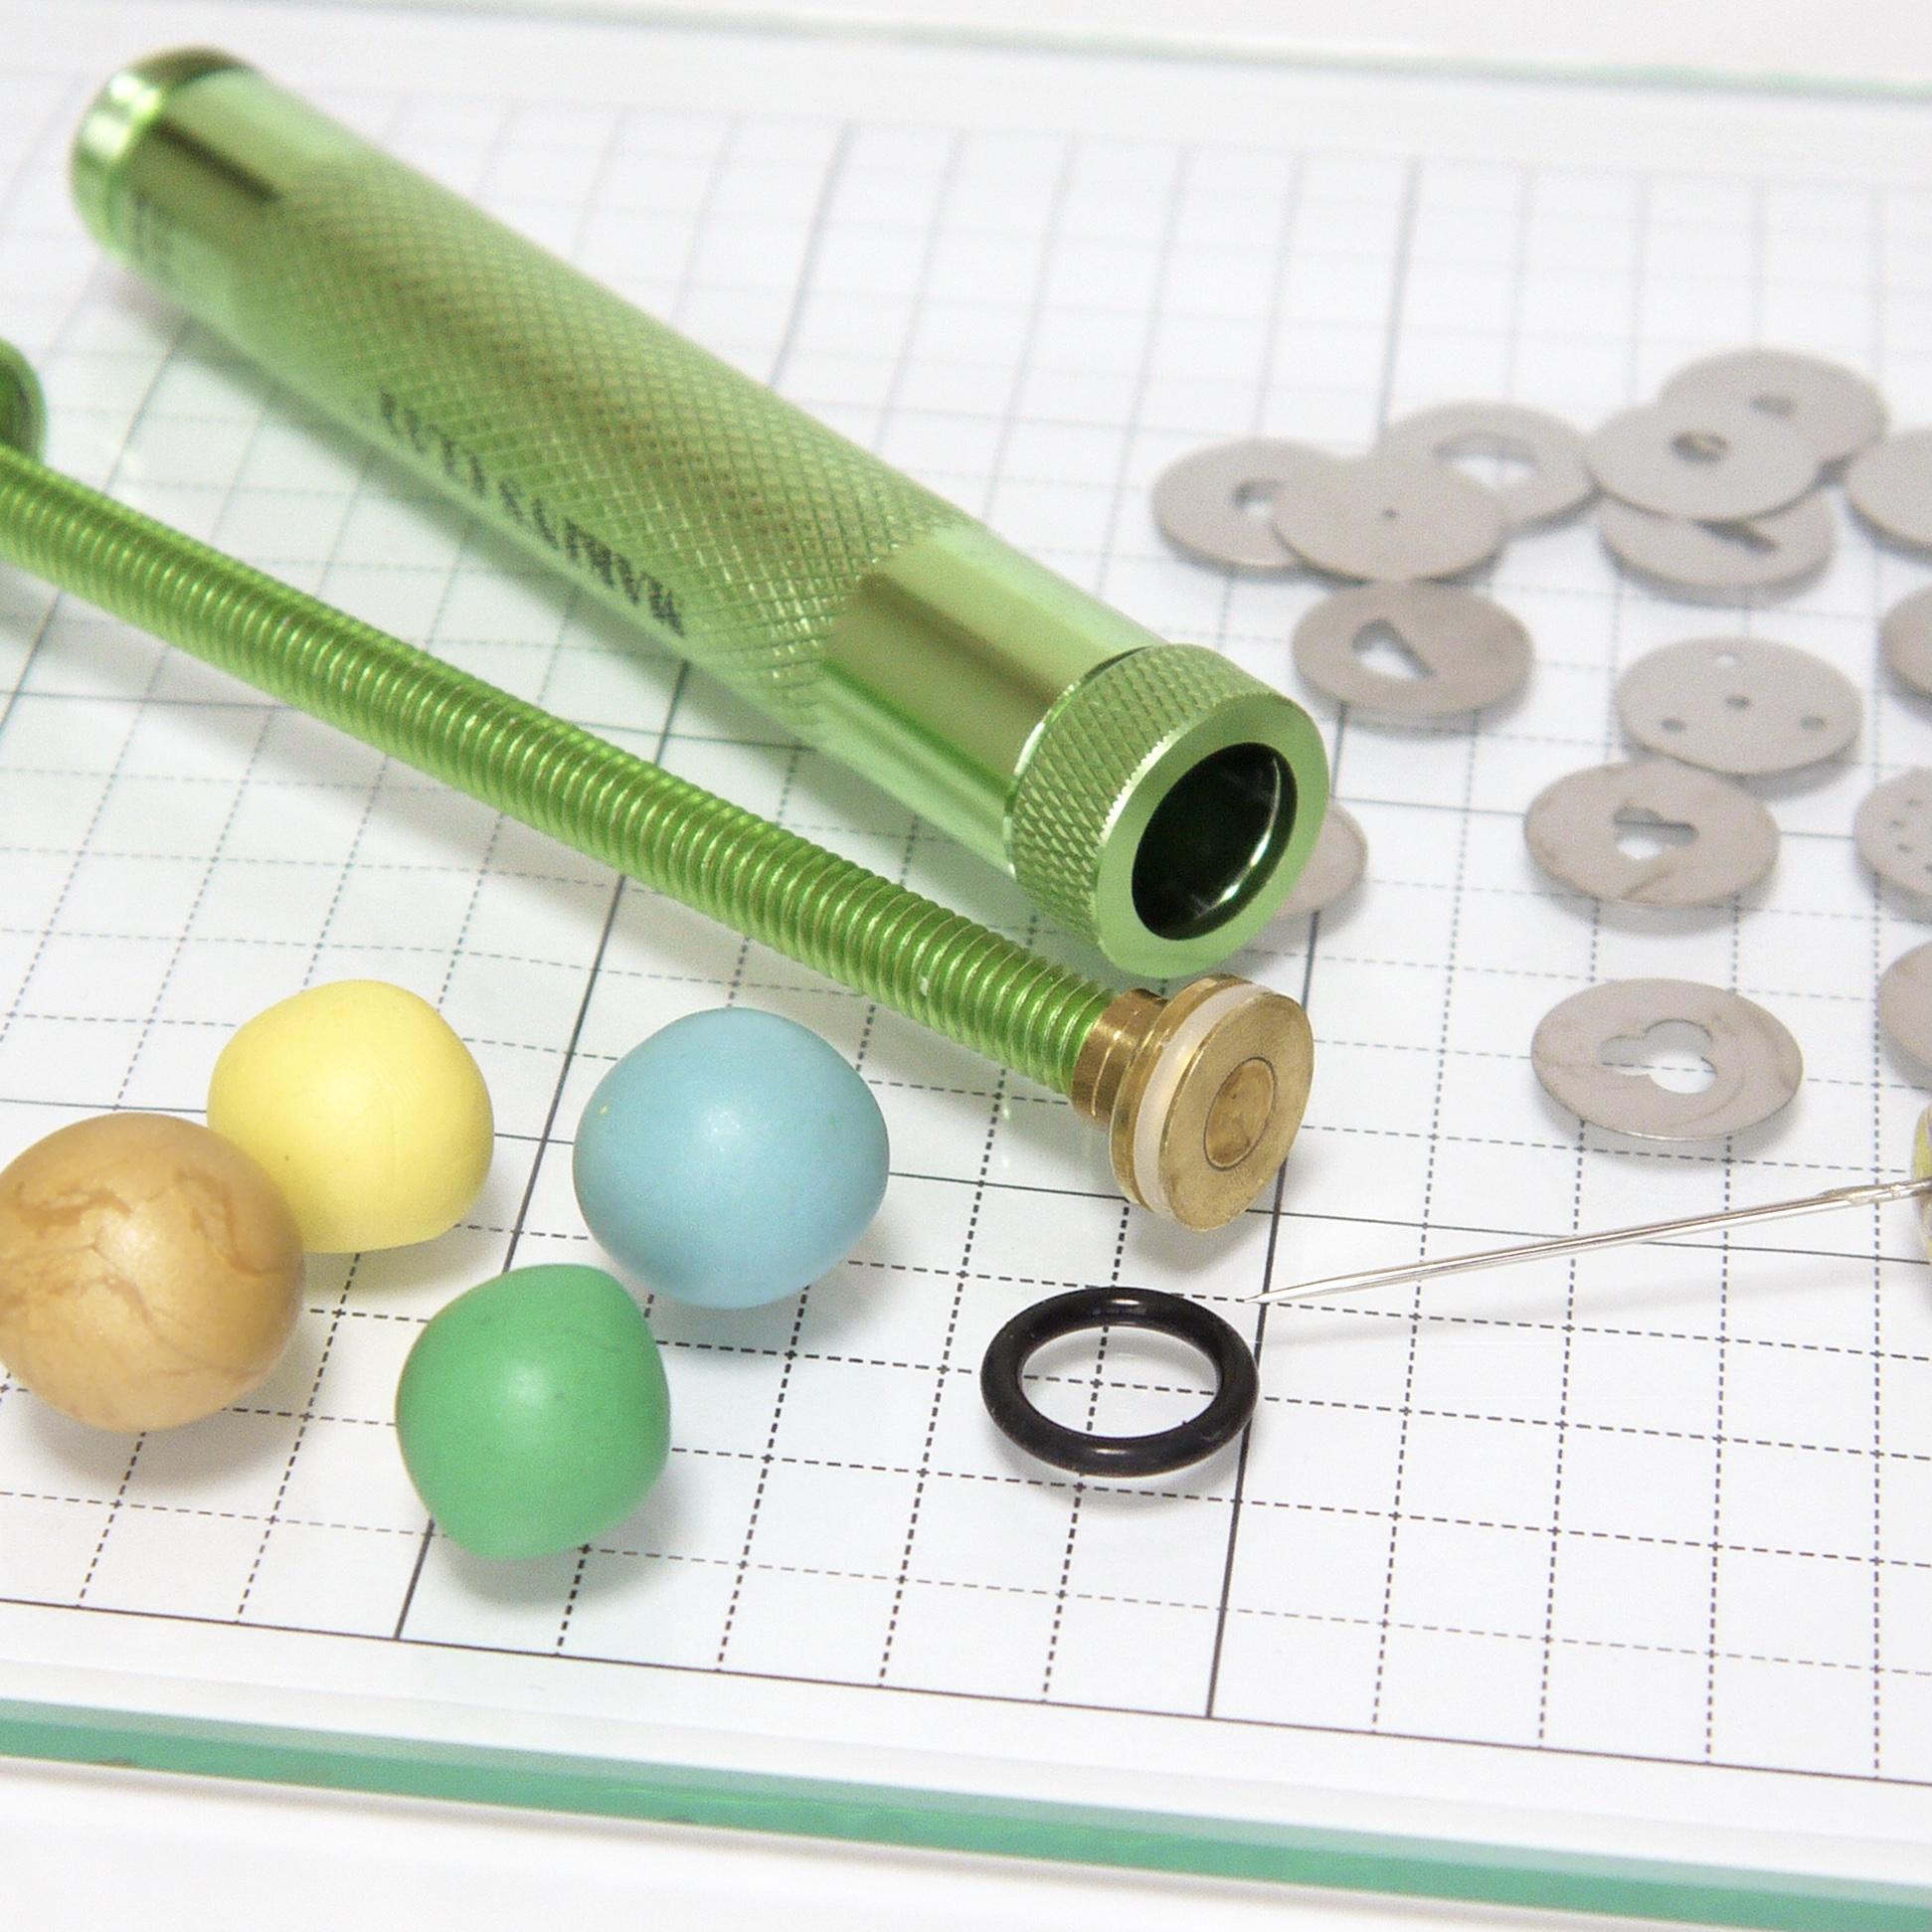 Polymer clay工具「クレイ エクストルーダ」ゴムリング